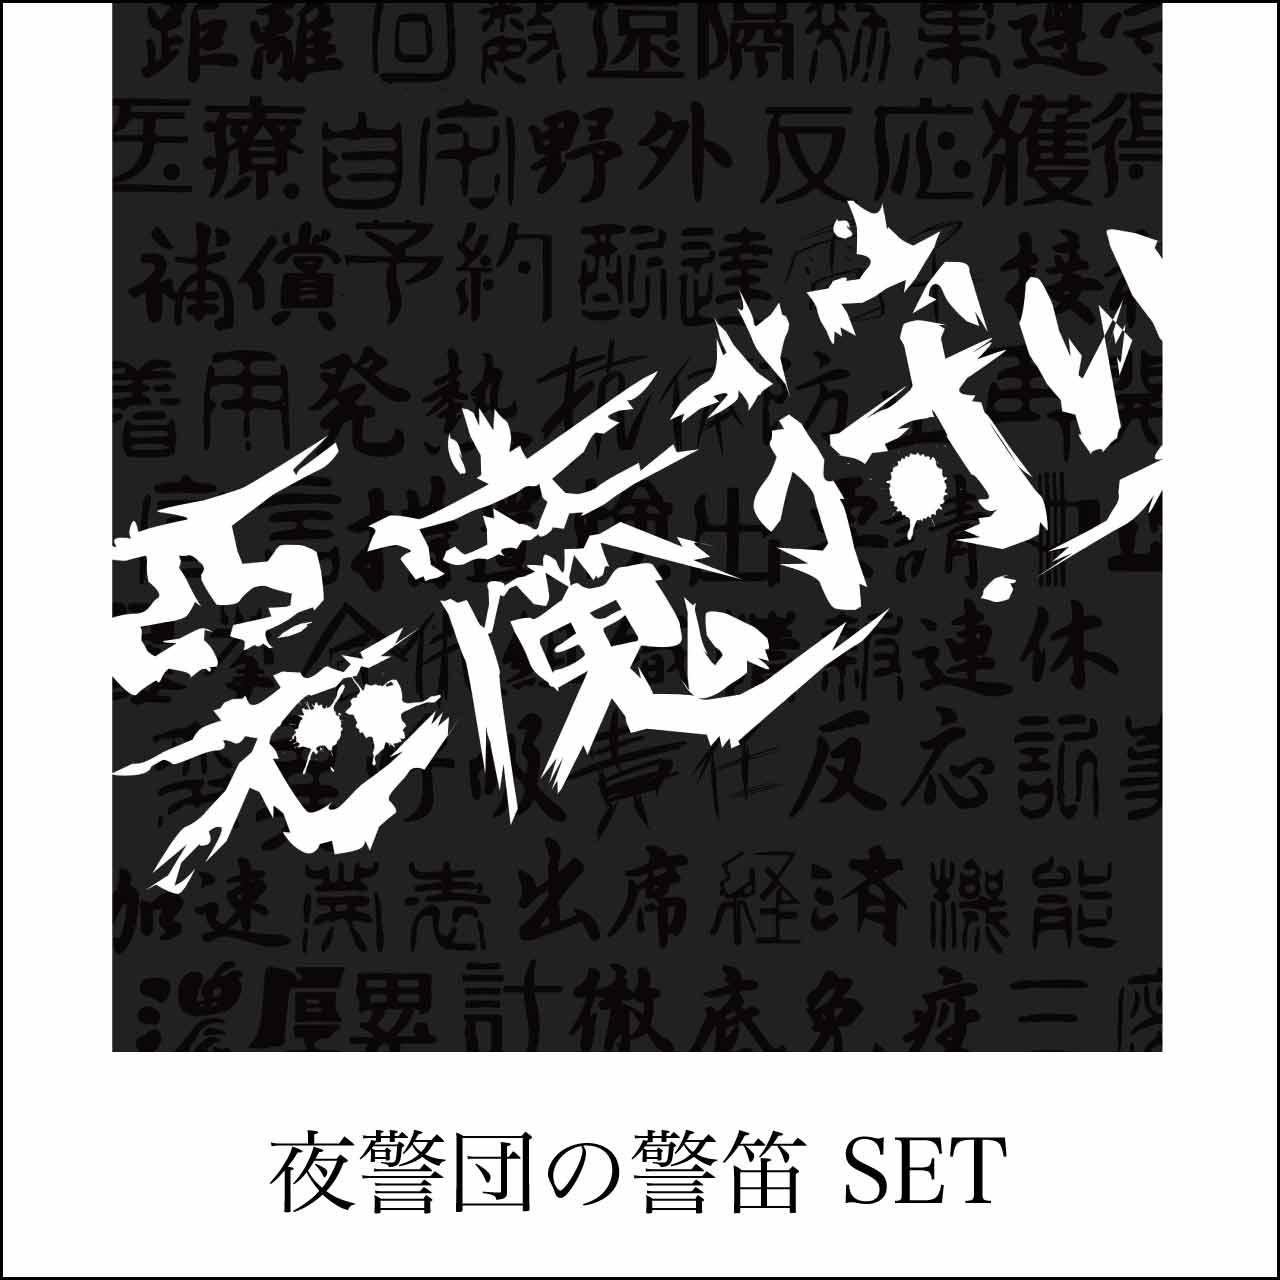 [CD]4th Single「悪魔狩り」 Premium|CD + 夜警団の警笛 SET [数量限定]